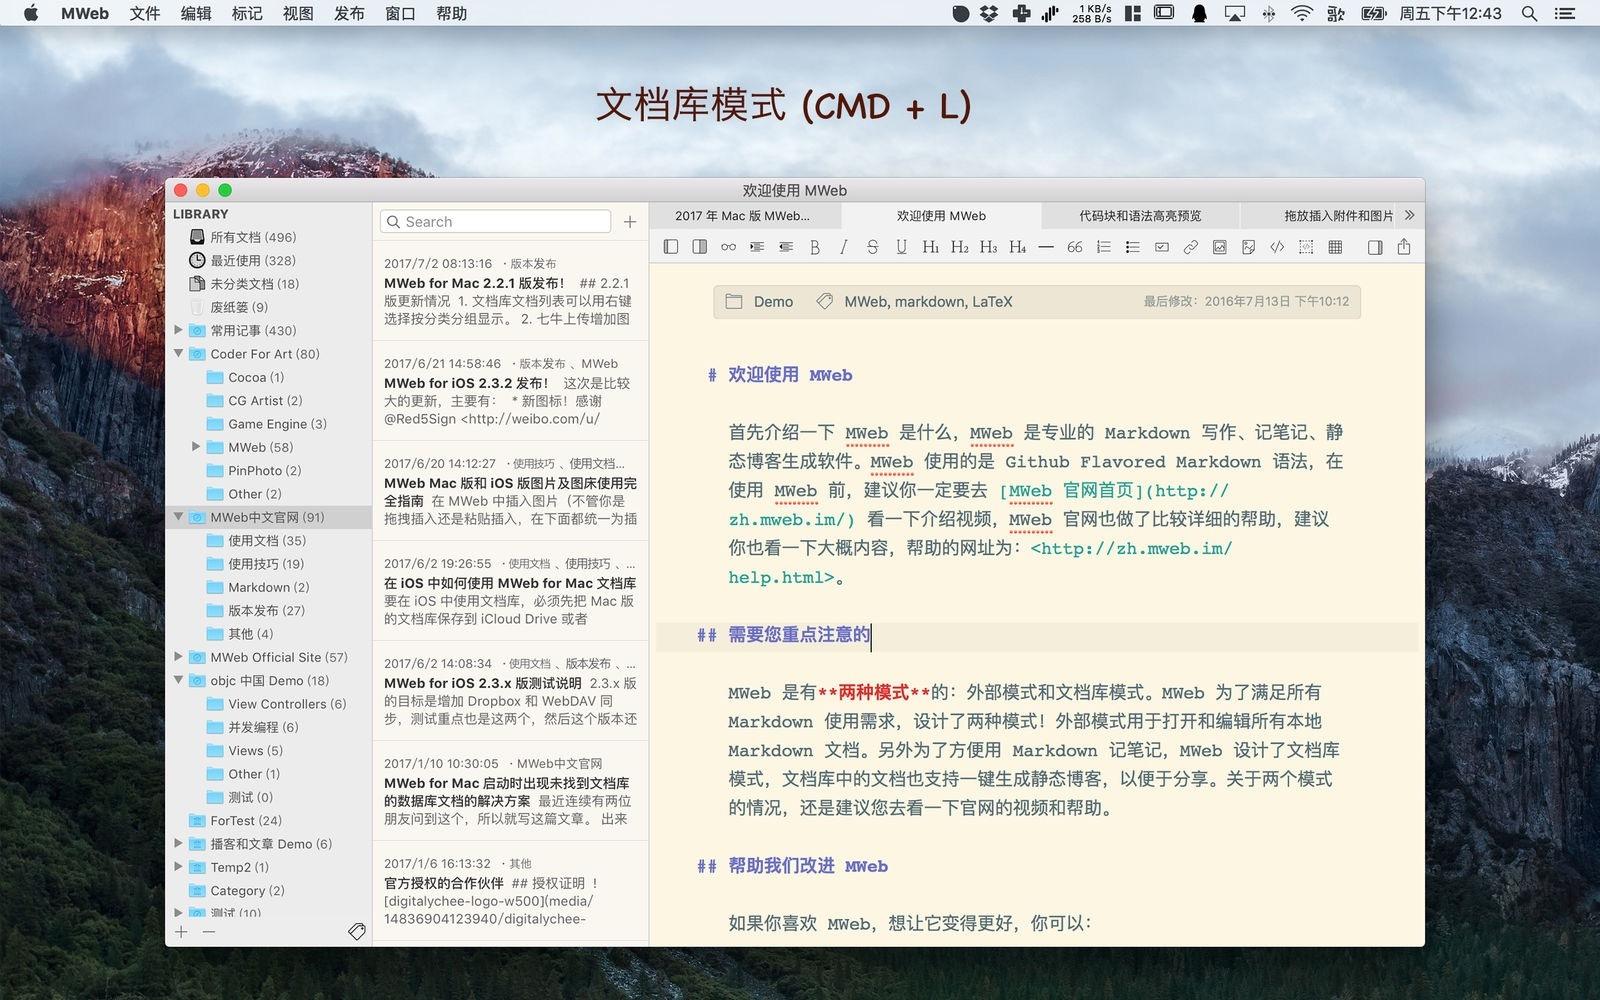 MWeb 3.4.2 for Mac 专业的Markdown写作软件-马克喵